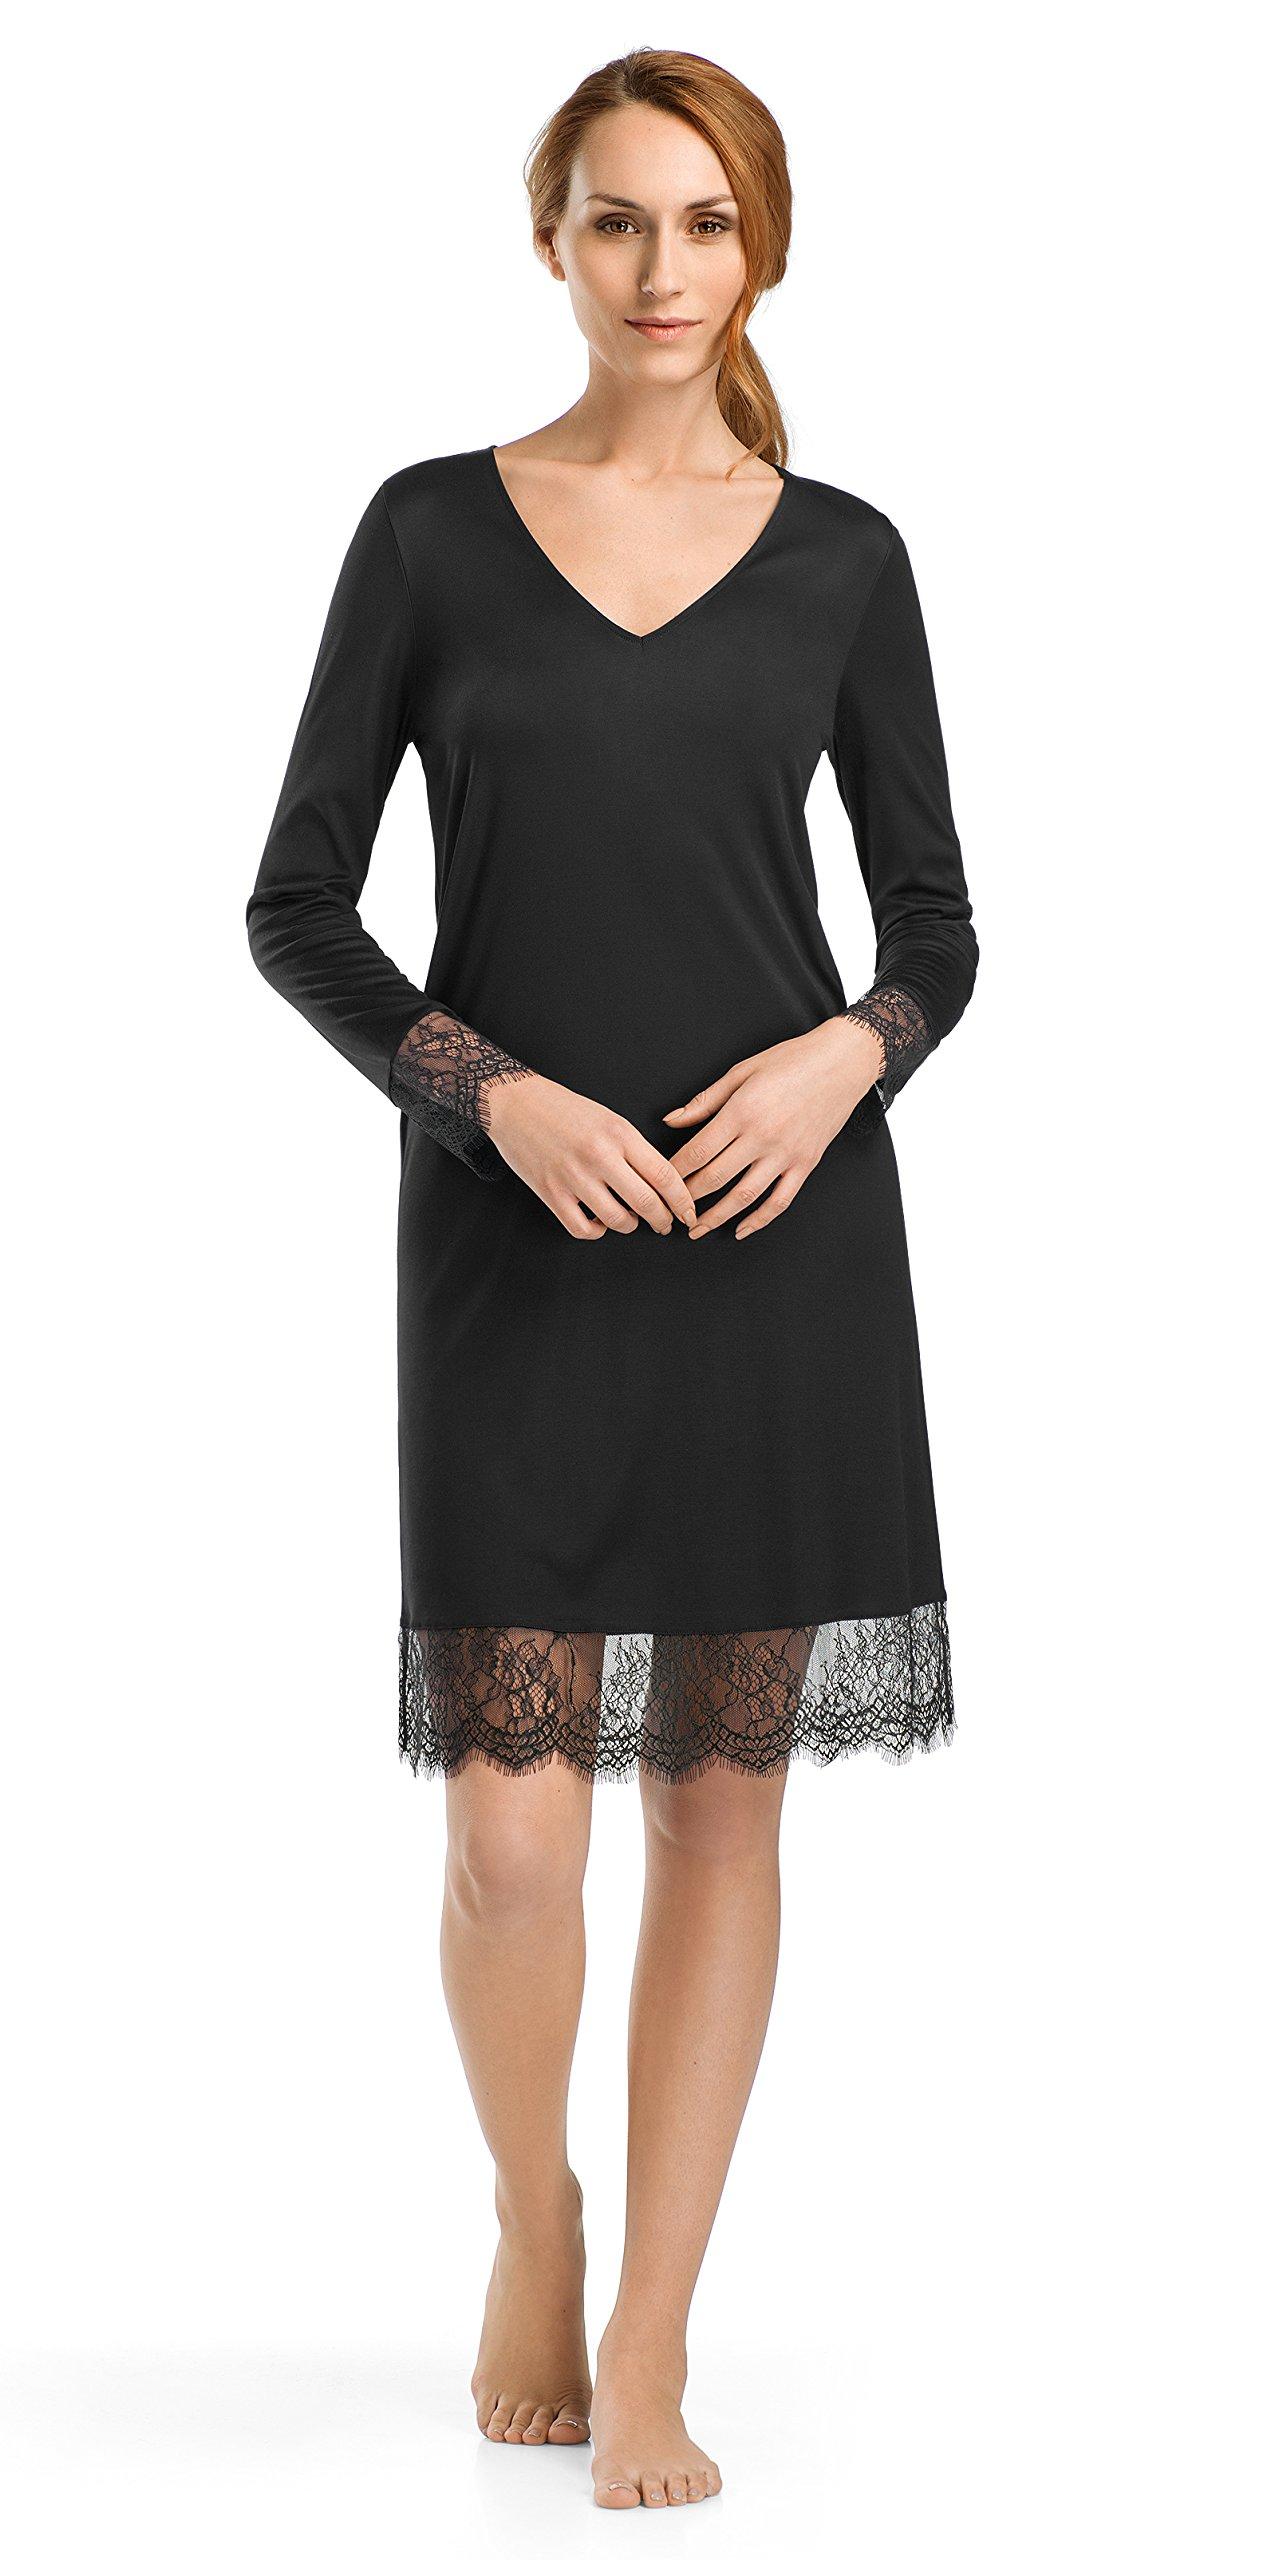 Hanro Women's Estelle Long Sleeve Gown, Black, Large